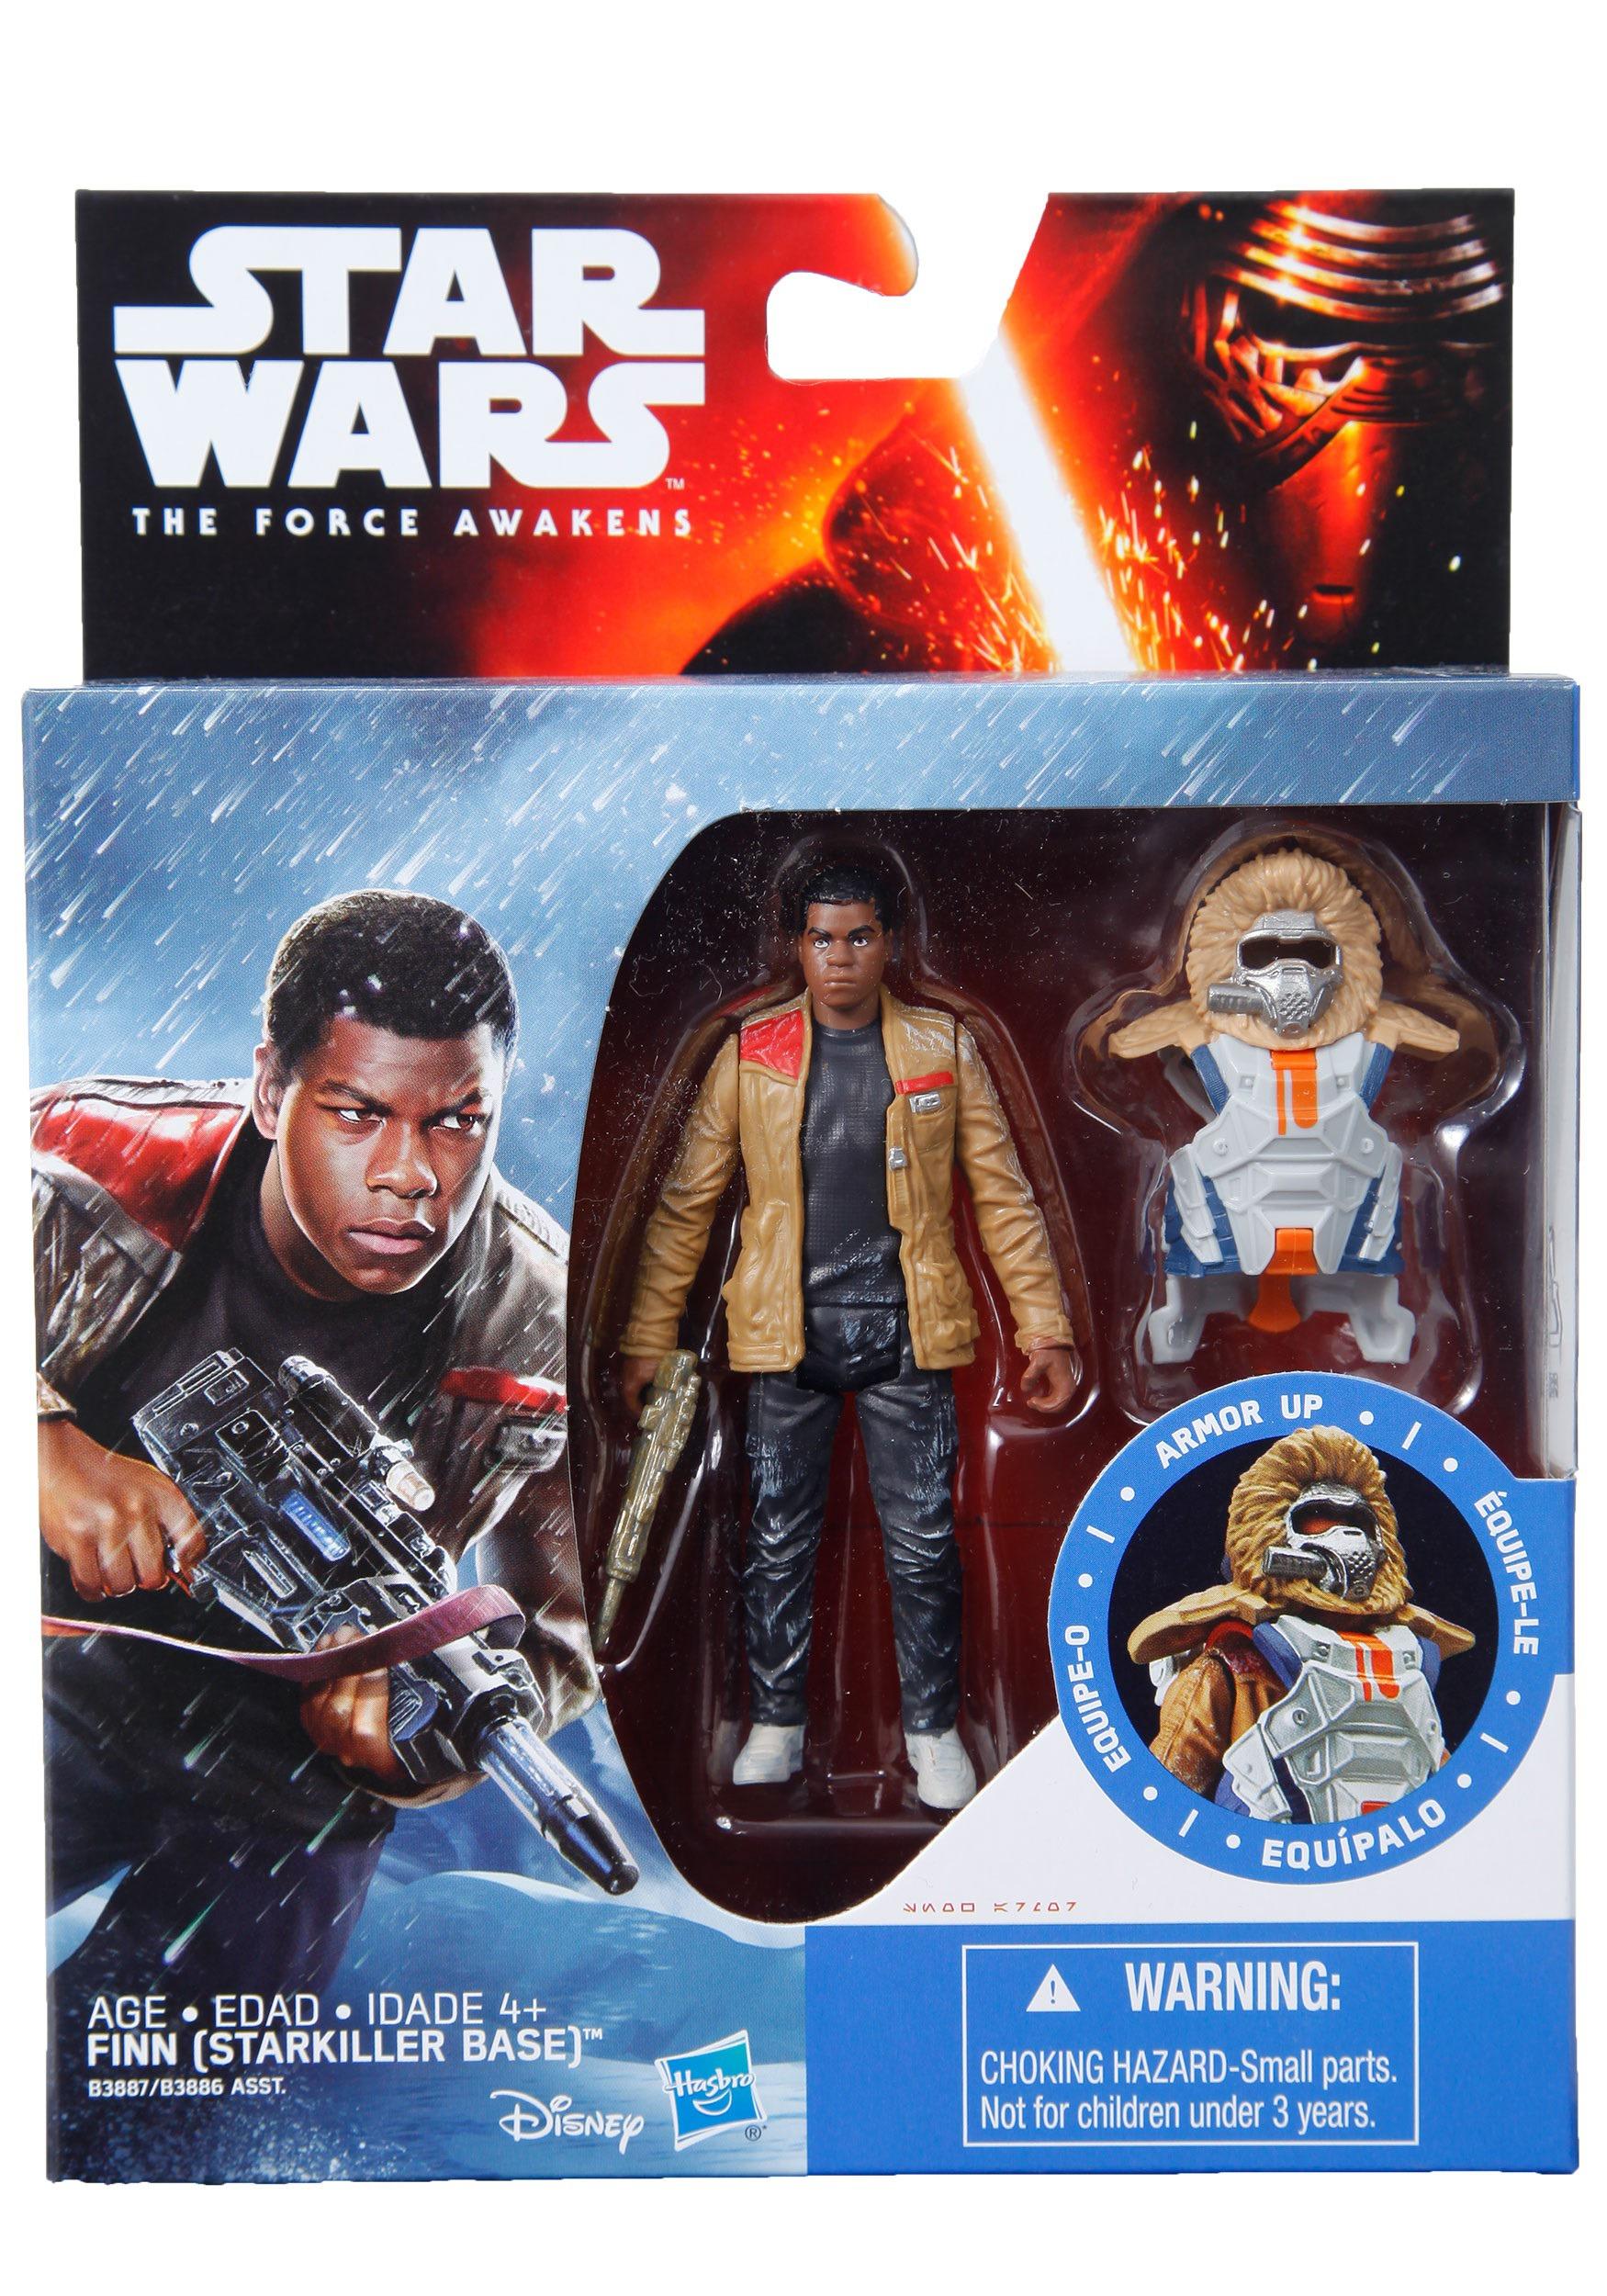 Star Wars The Force Awakens Finn (Starkiller Base) Figure EEDB3887